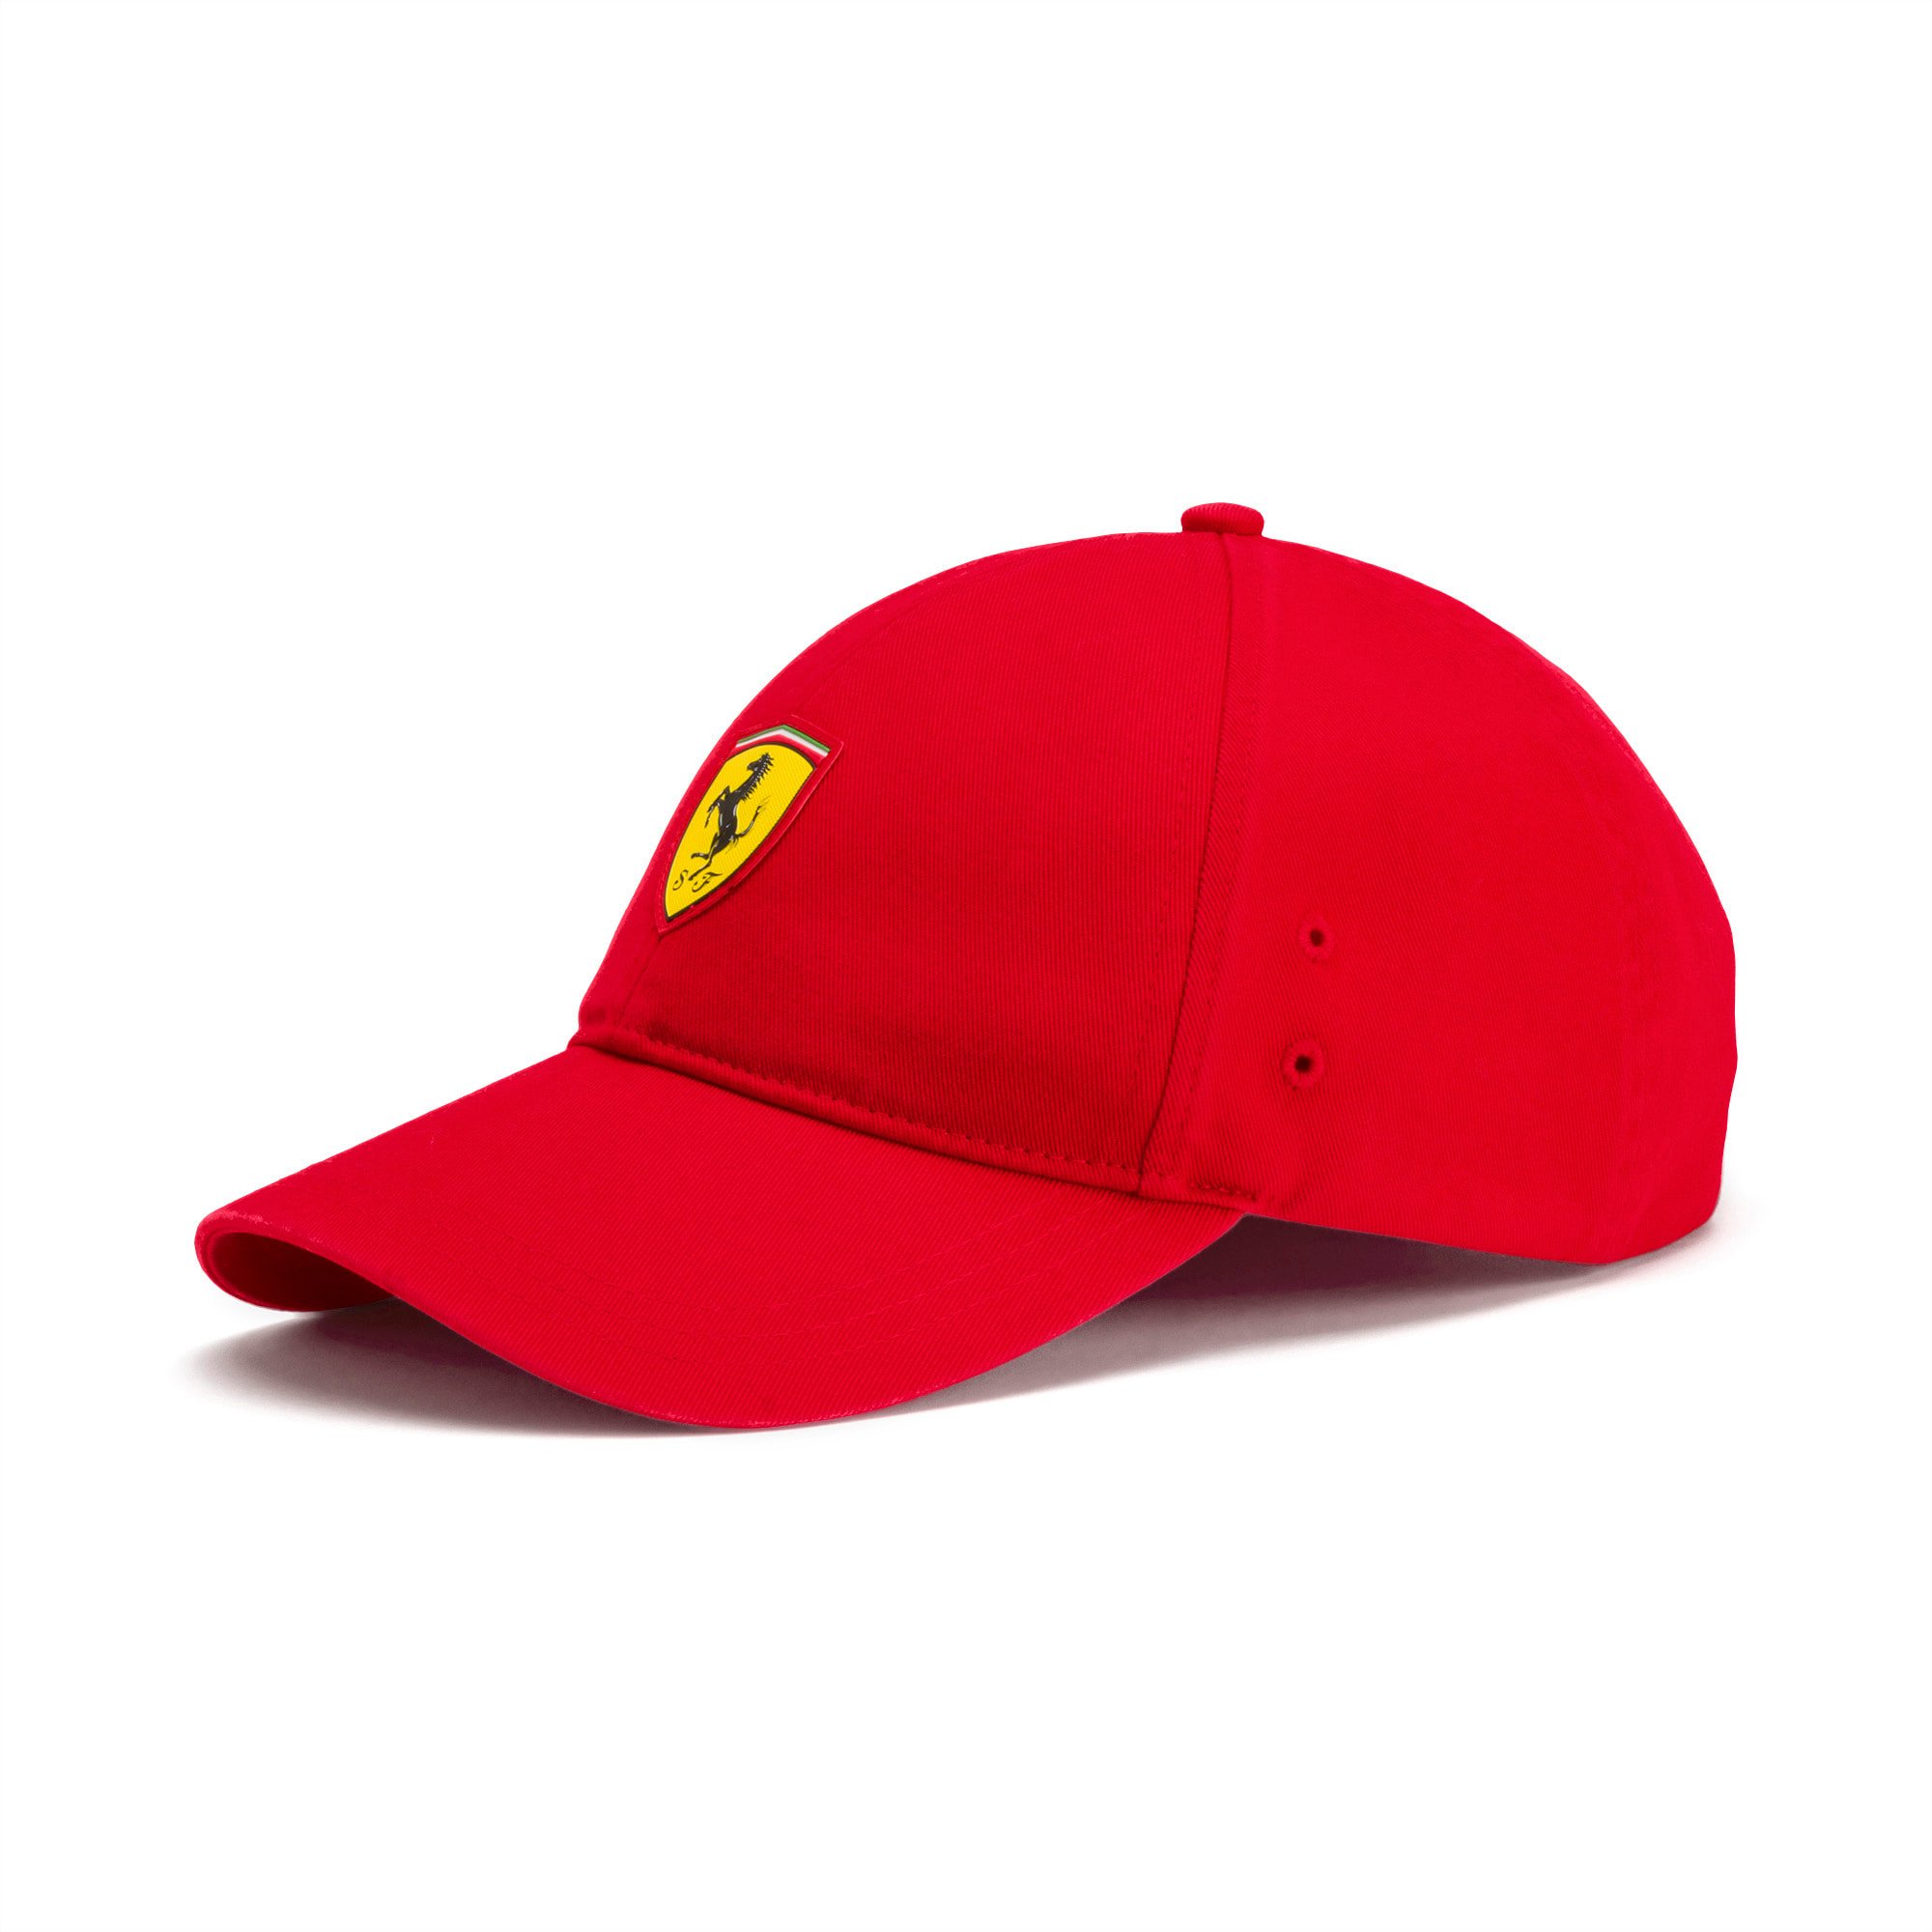 أبوي قذر قمة الرأس Ferrari Cap Red Outofstepwineco Com